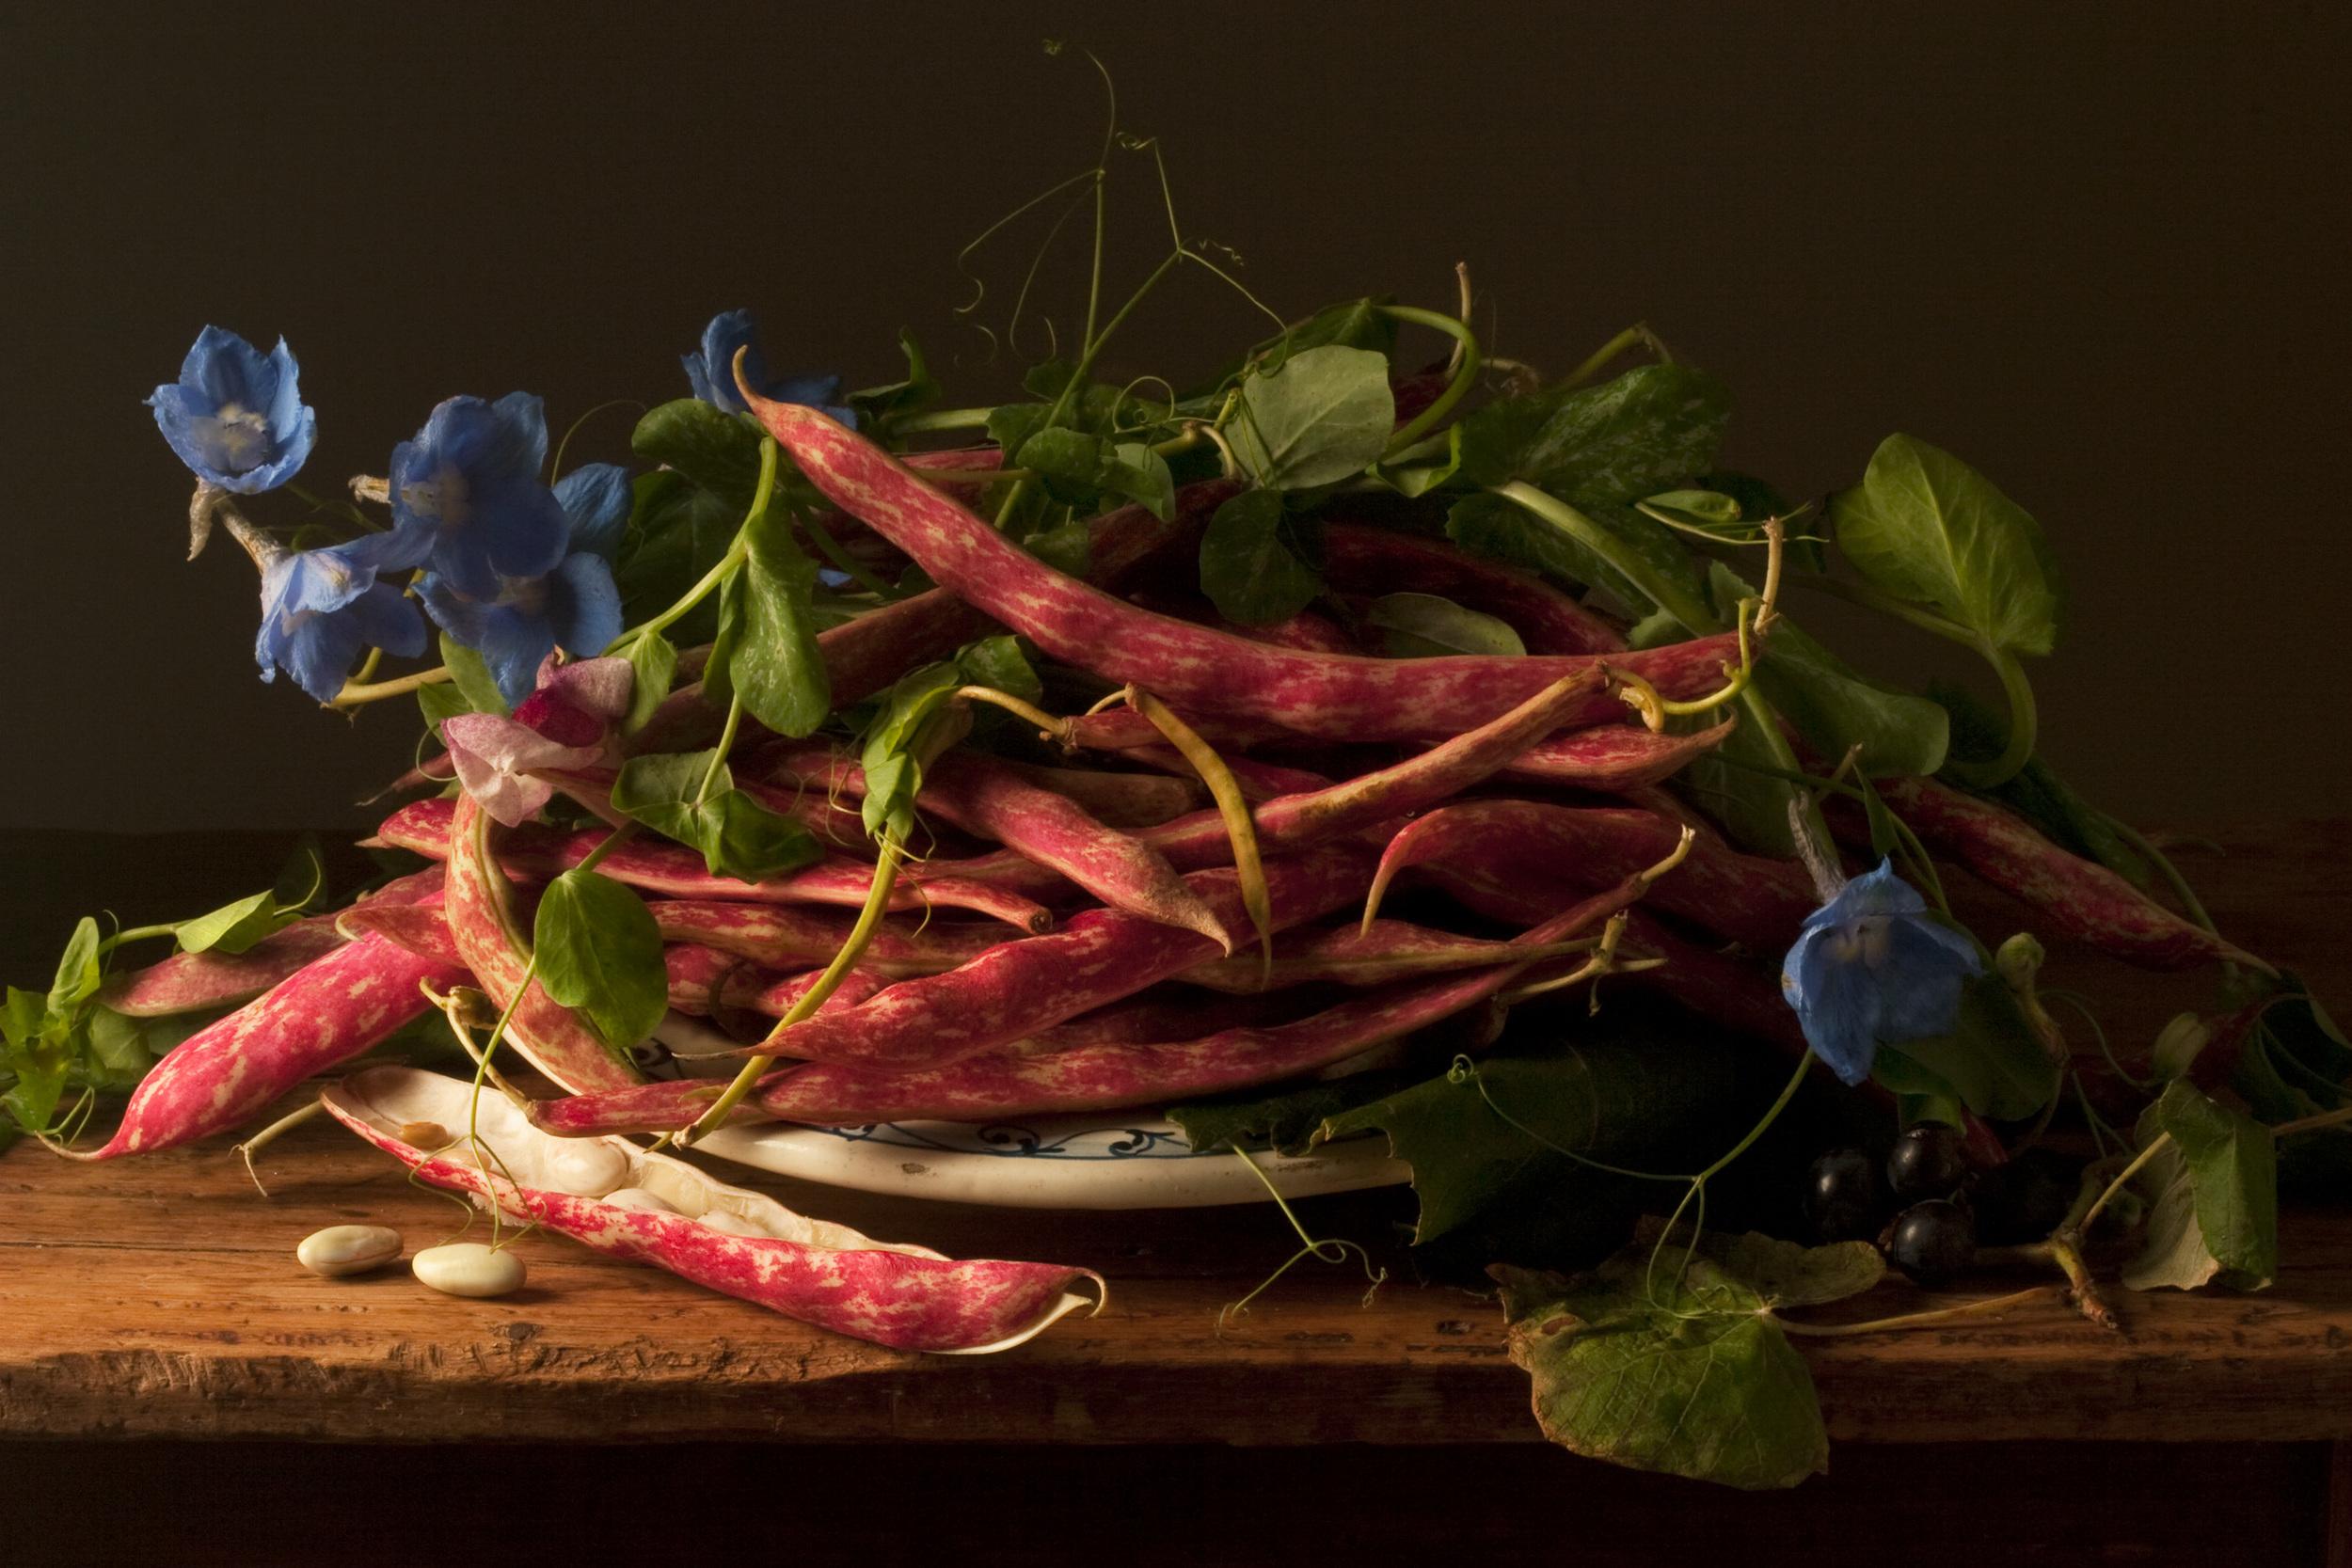 Cranberries Beans, After G.G., 2009